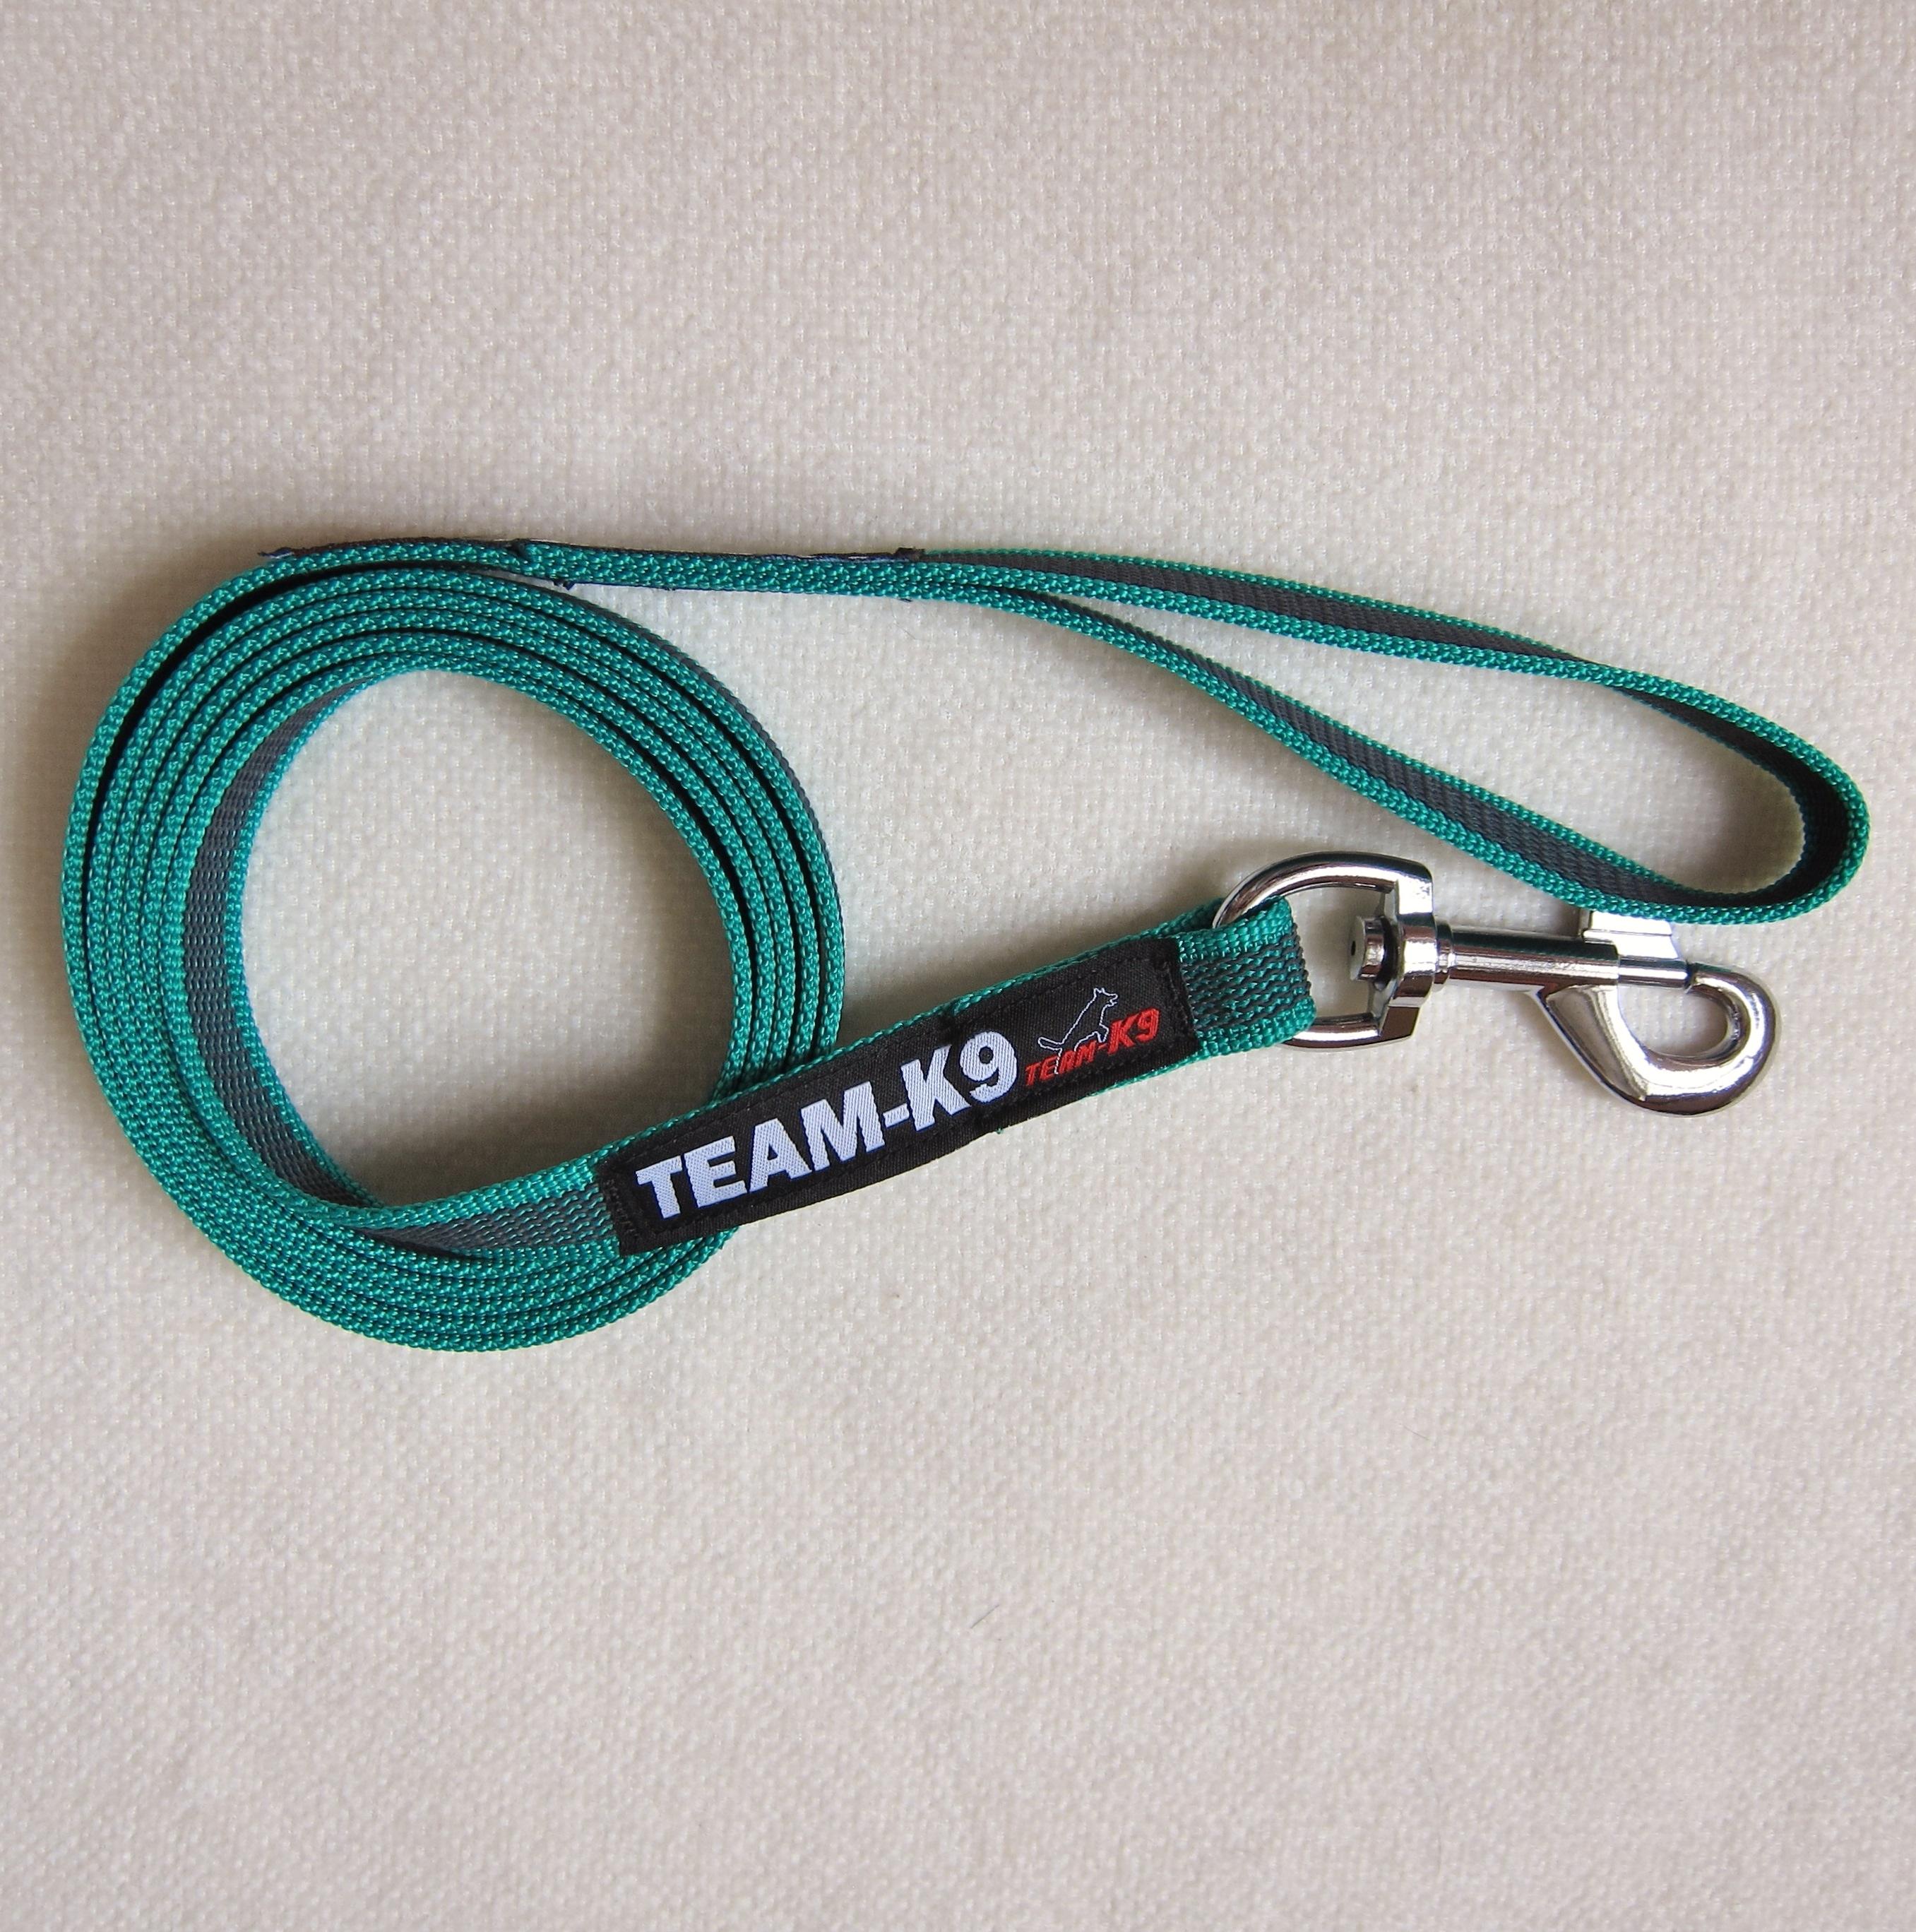 dog leash, dog leashes, green dog leash, dog training, quality dog leash, IPO, TEAM-K9, textil wide rubber, mississauga, ontario, oakville, brampton, toronto, GTA